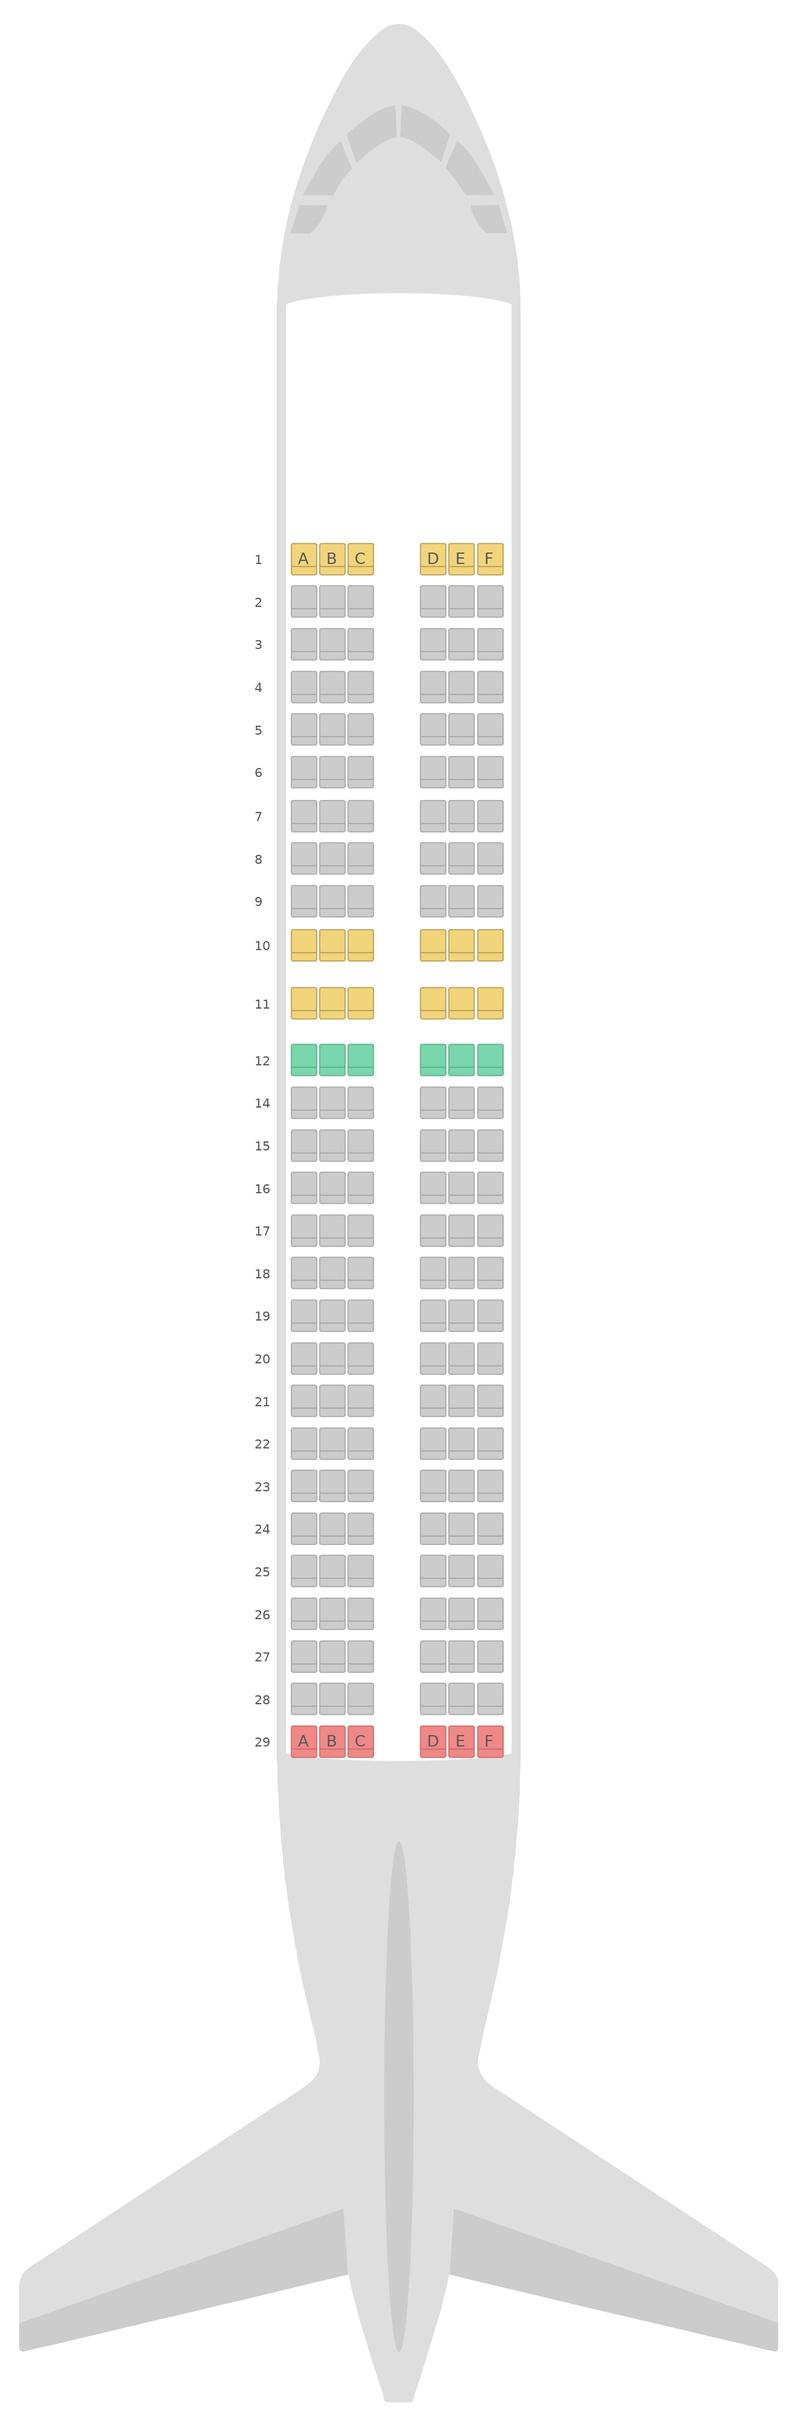 Sitzplan Airbus A320 Scandinavian Airlines (SAS)